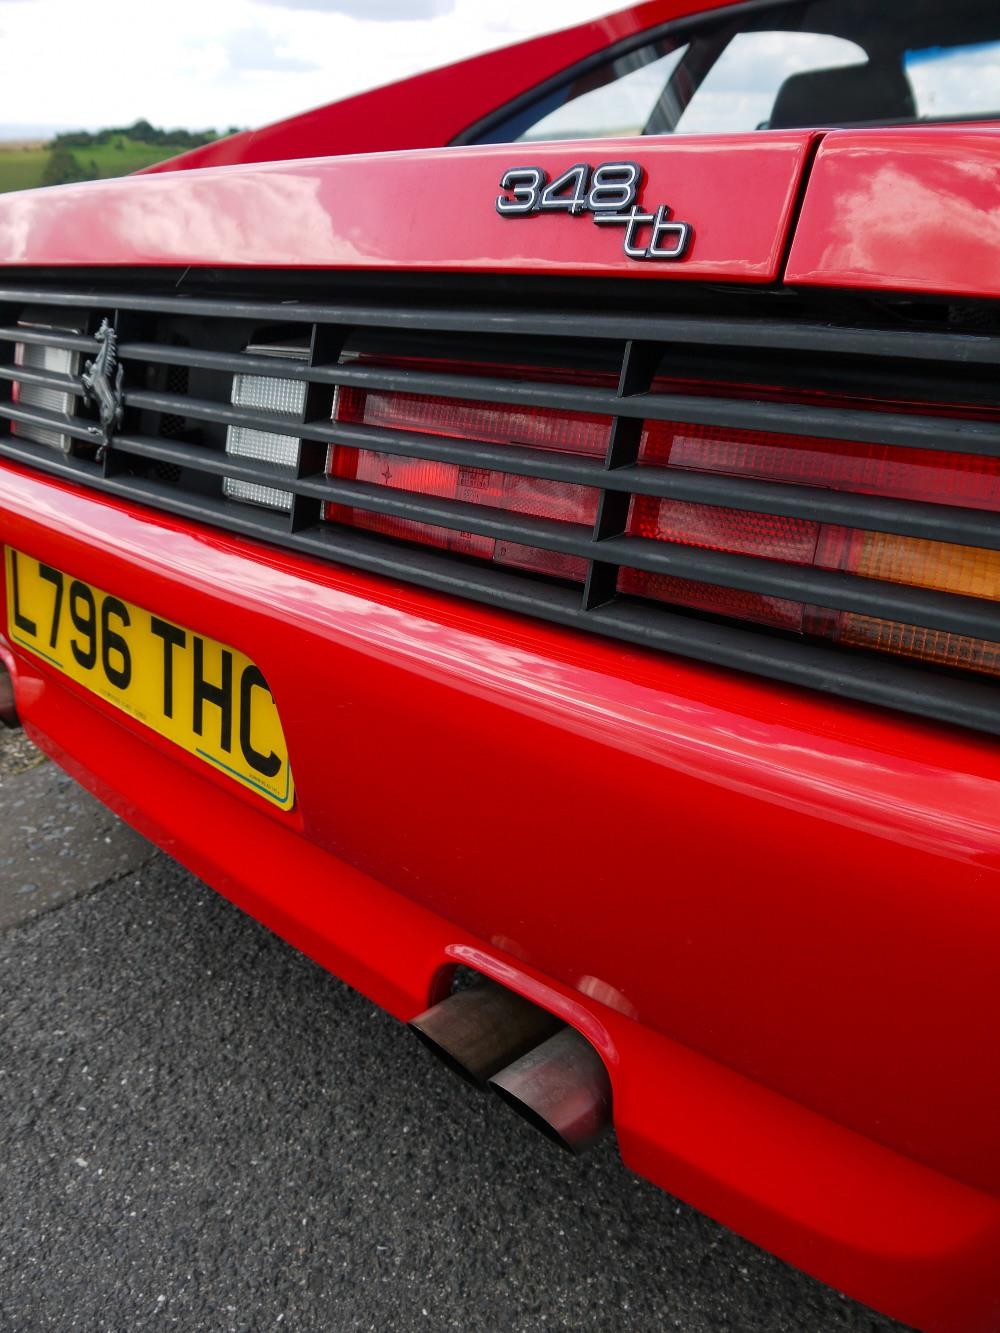 1993 FERRARI 348 TRASVERSALE BERLINETTA Registration Number: L796THC Chassis Number: - Image 10 of 49